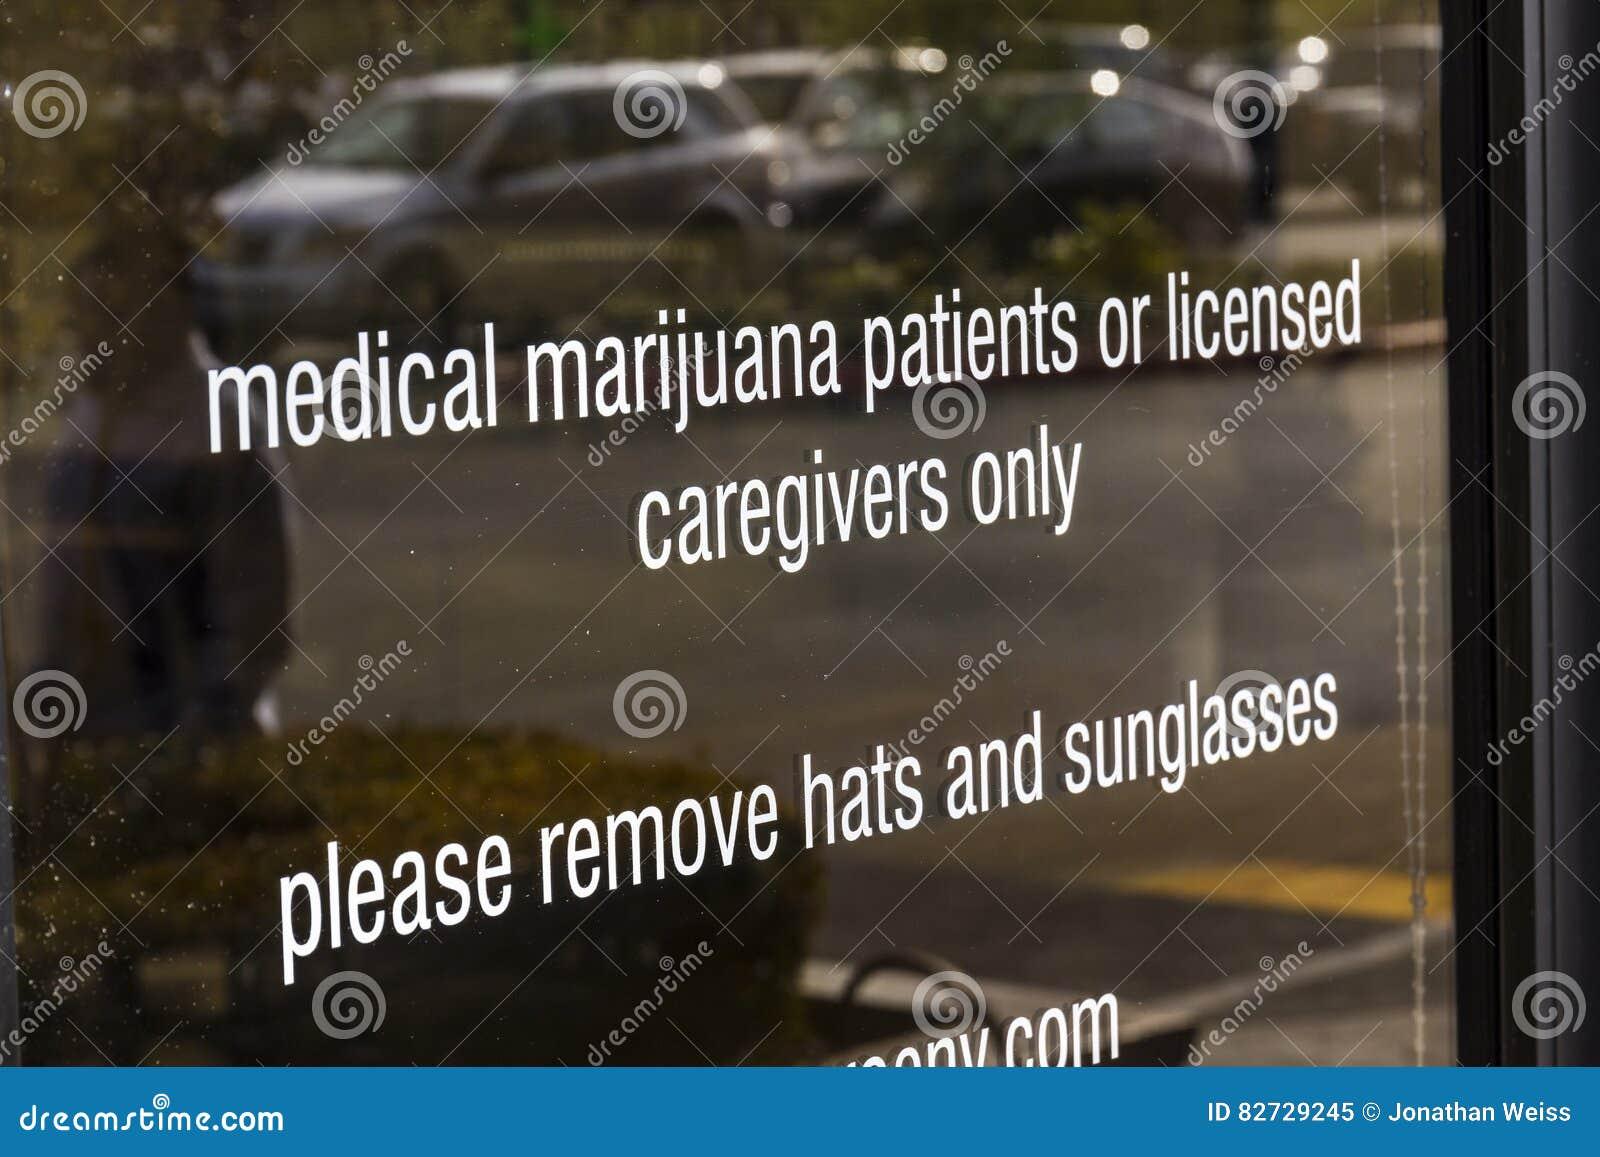 Henderson - το Δεκέμβριο του 2016 Circa: Το ιατρικό ιατρείο μαριχουάνα του Λας Βέγκας πηγής Το 2017, το δοχείο θα είναι νομικό στ